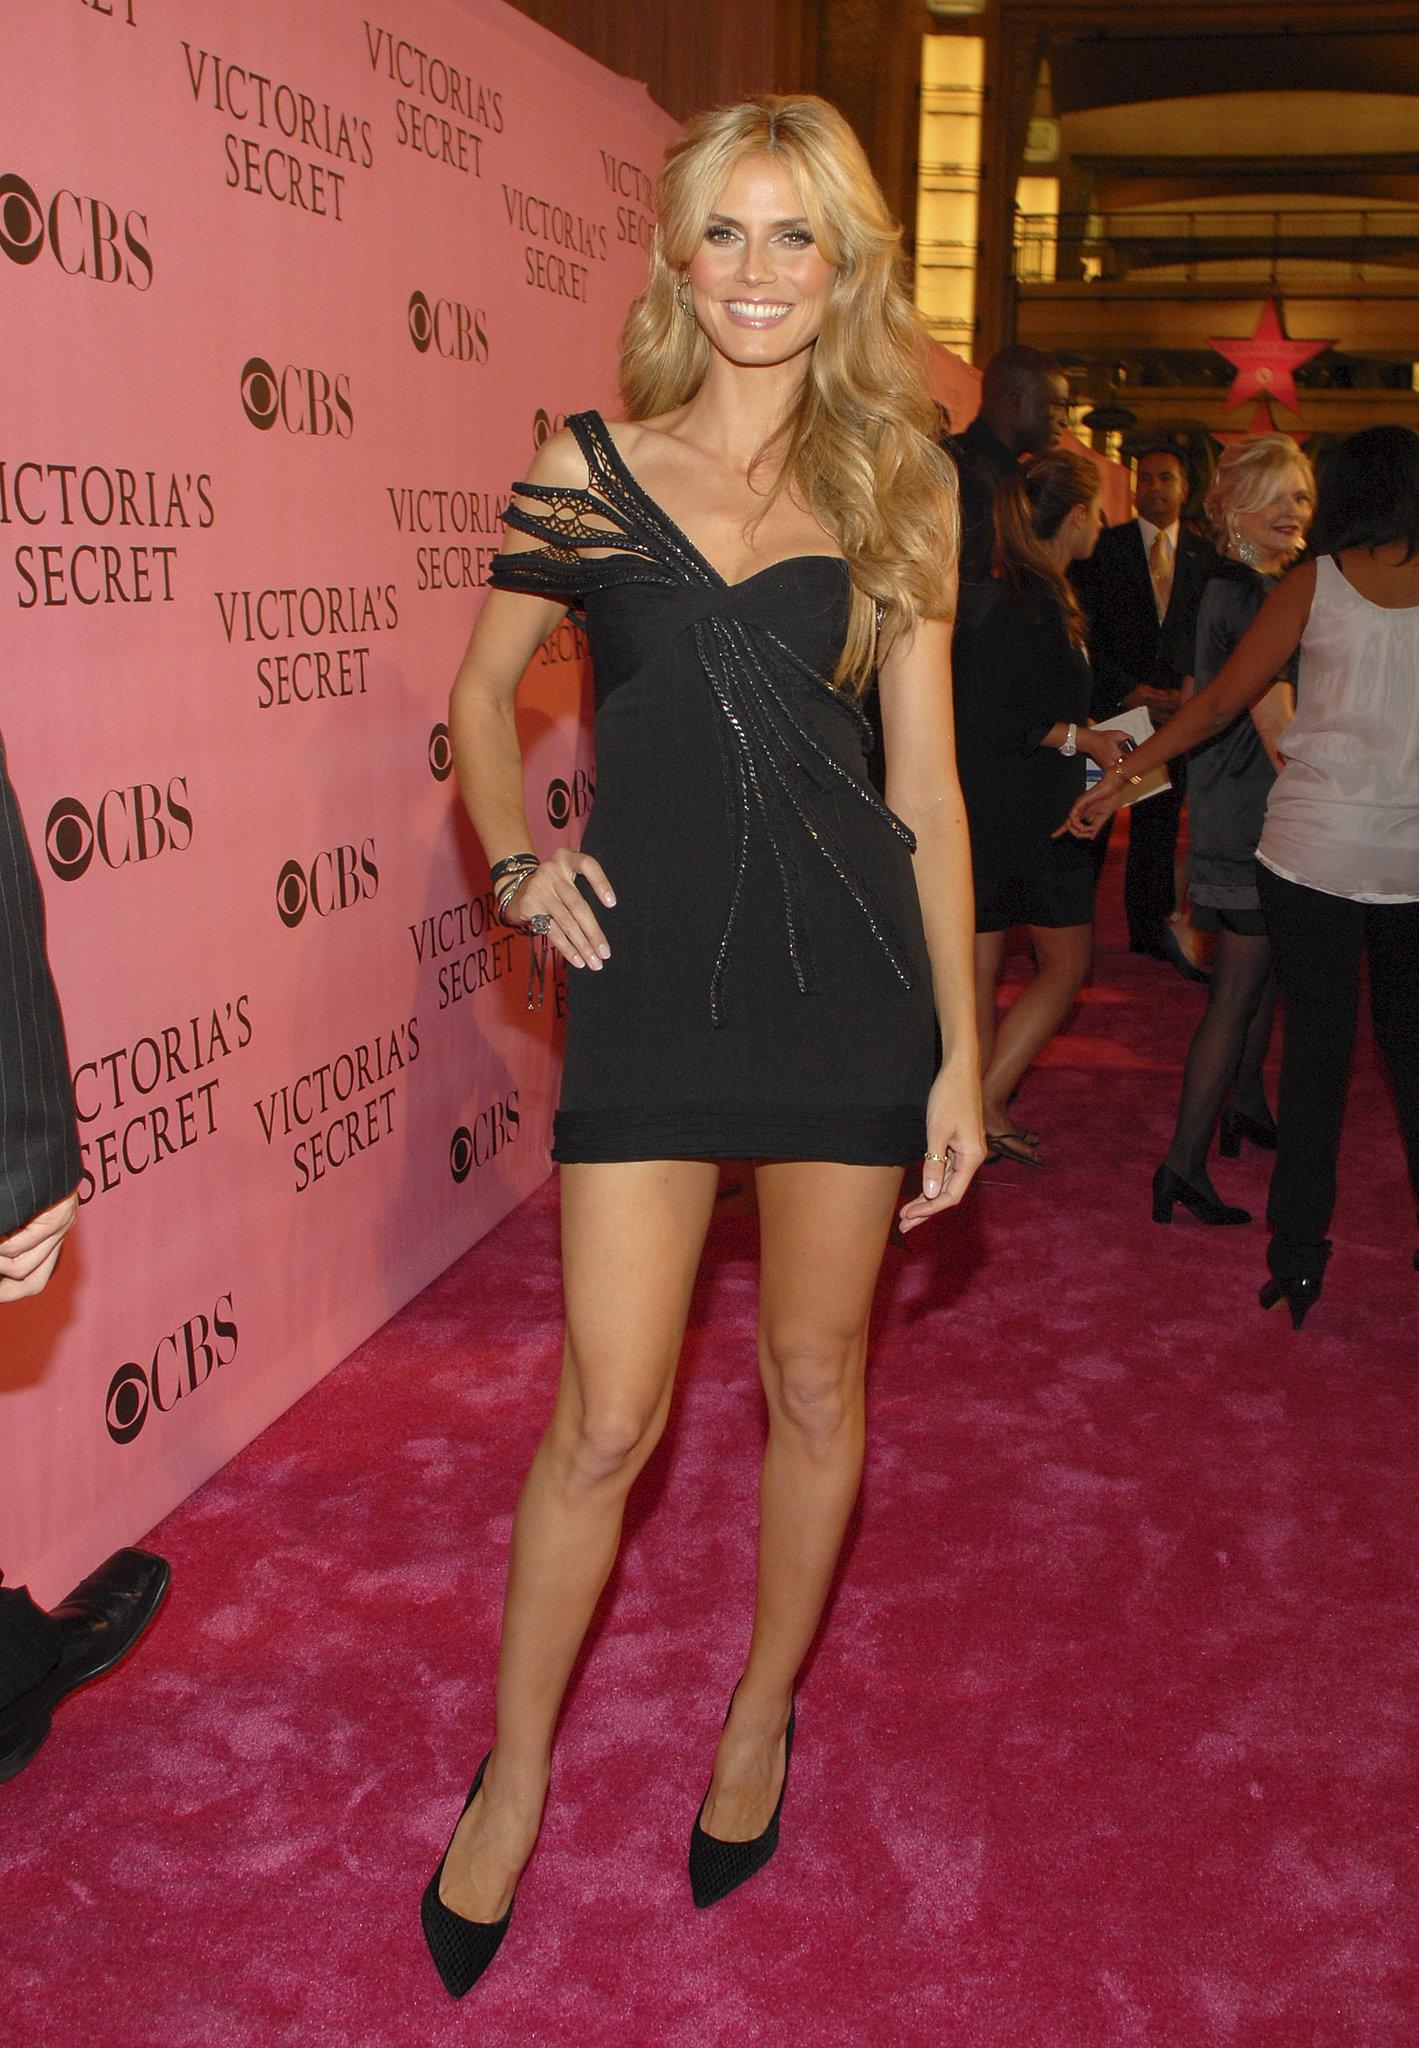 Heidi Klum in a One-Shoulder LBD at the 2007 Victoria's Secret Fashion Show